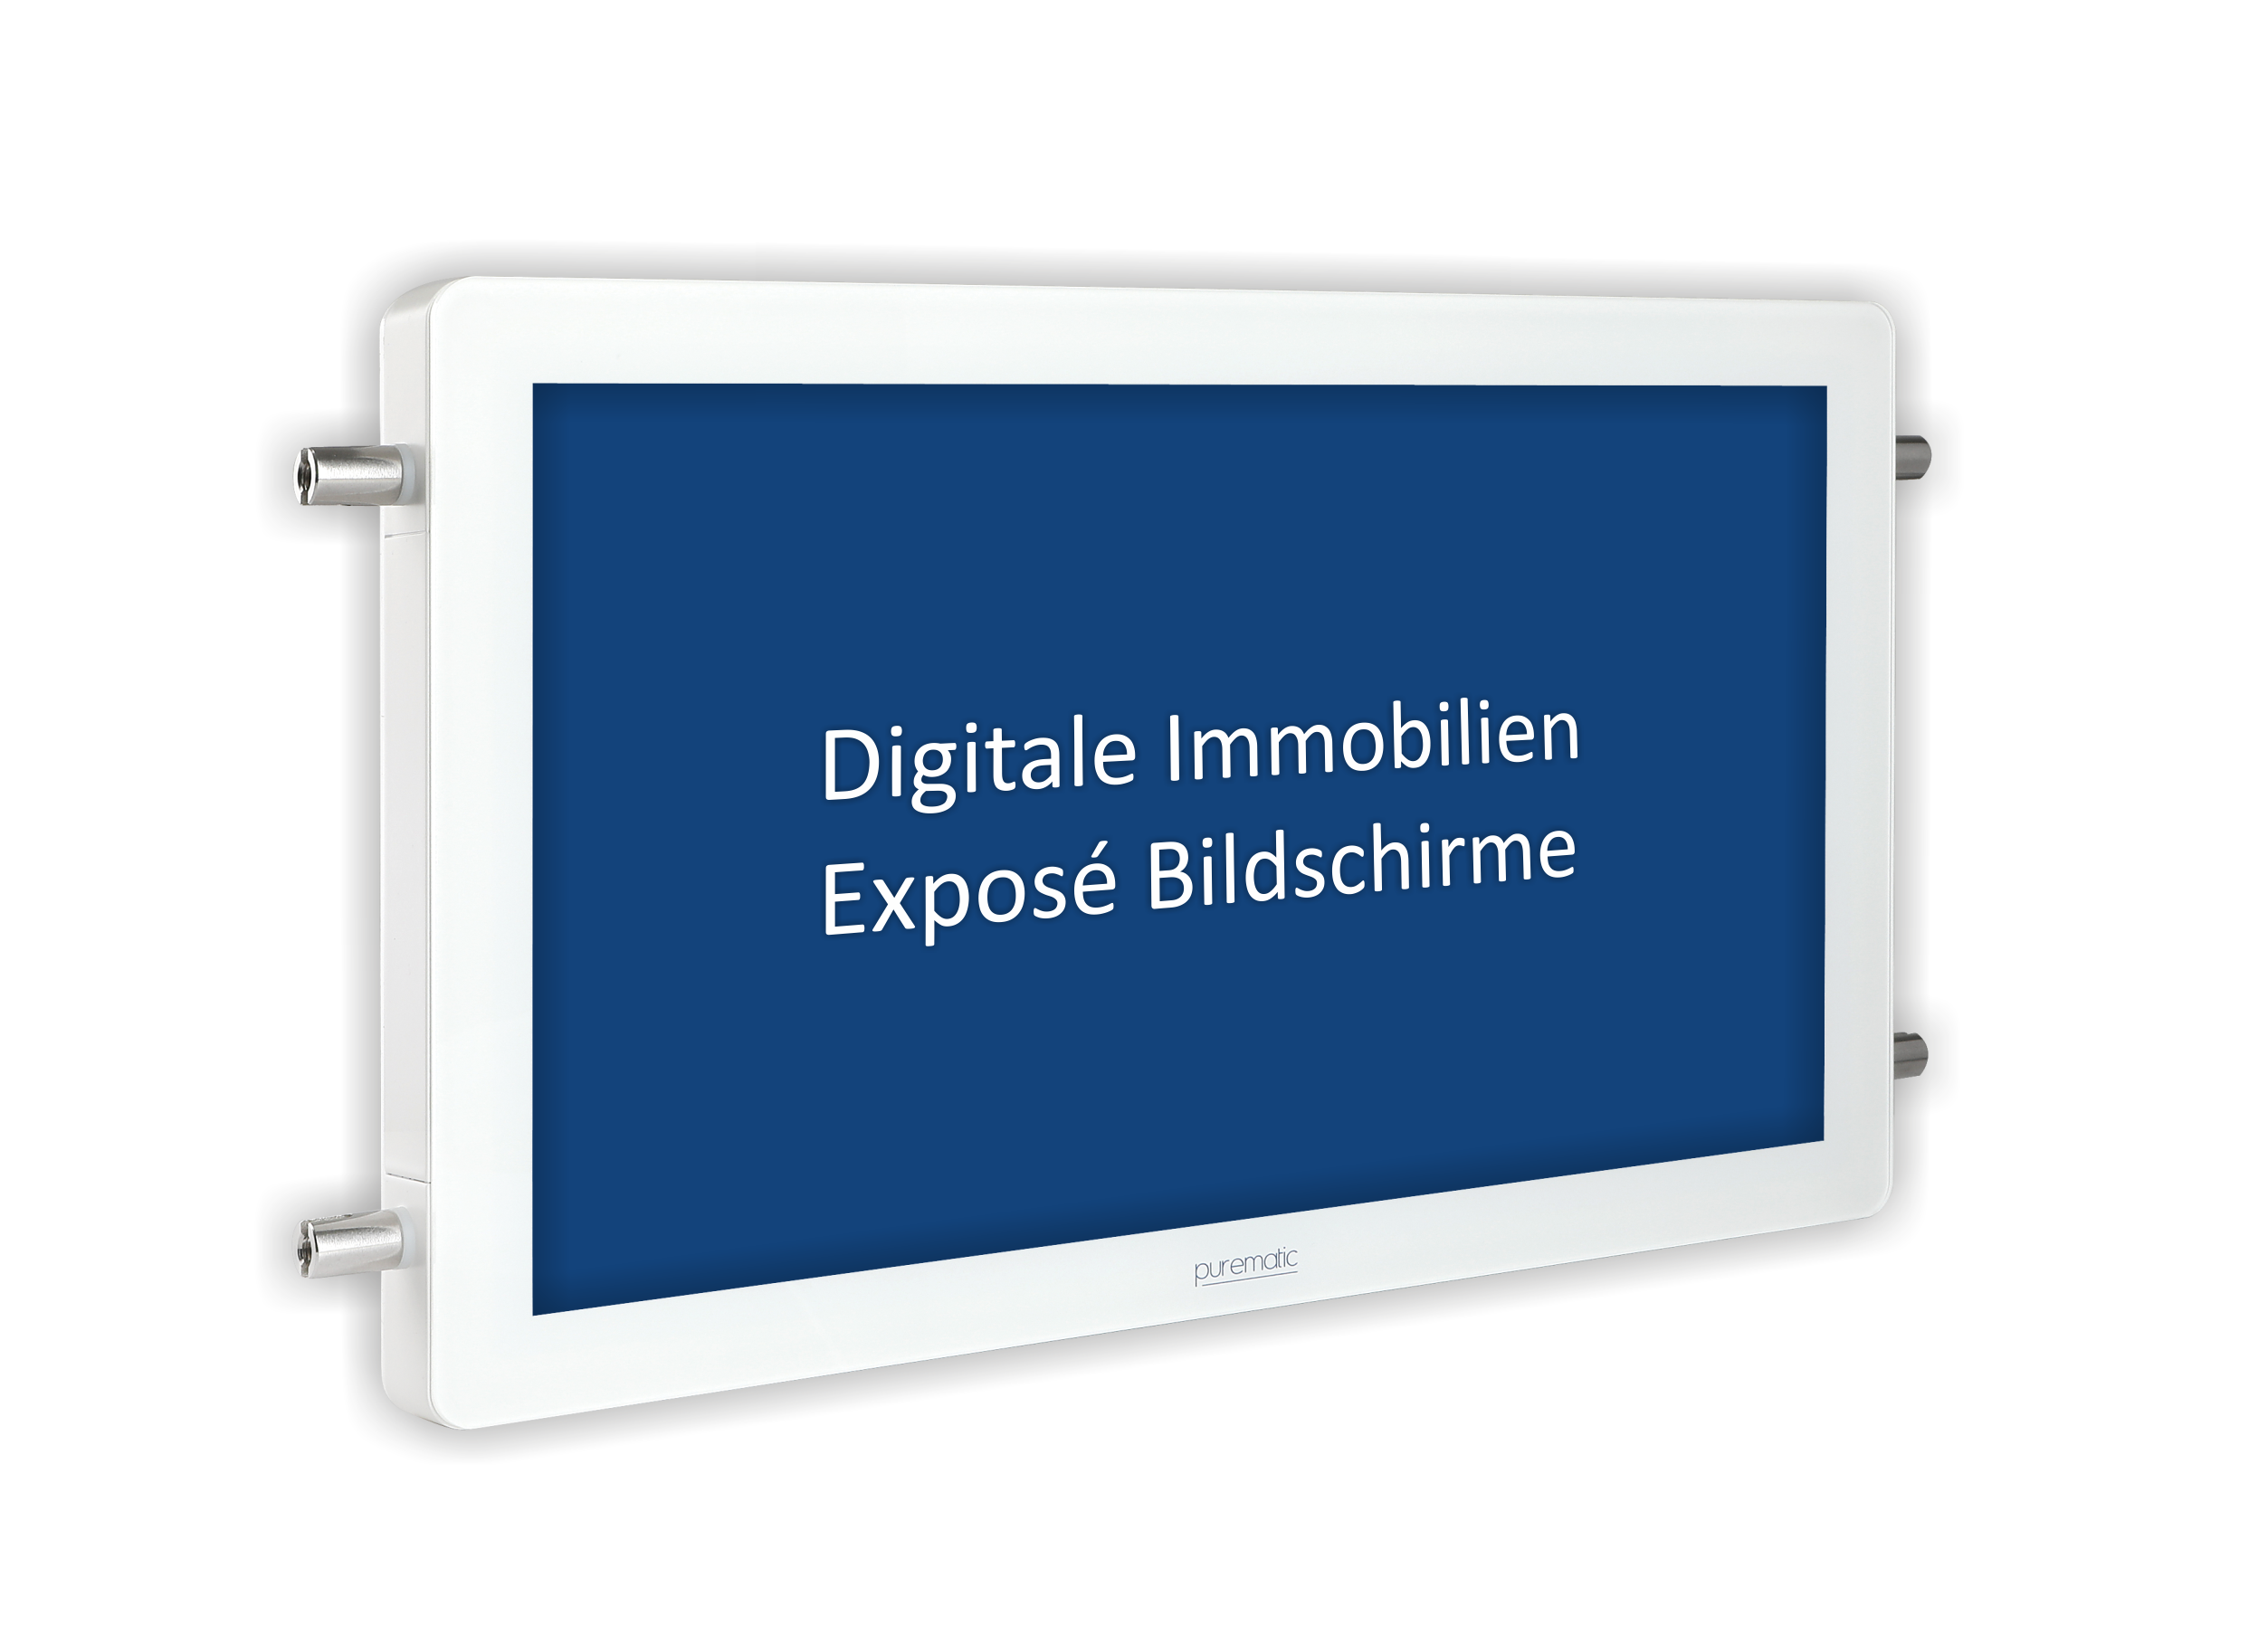 Preise pure.DSS Digital Signage